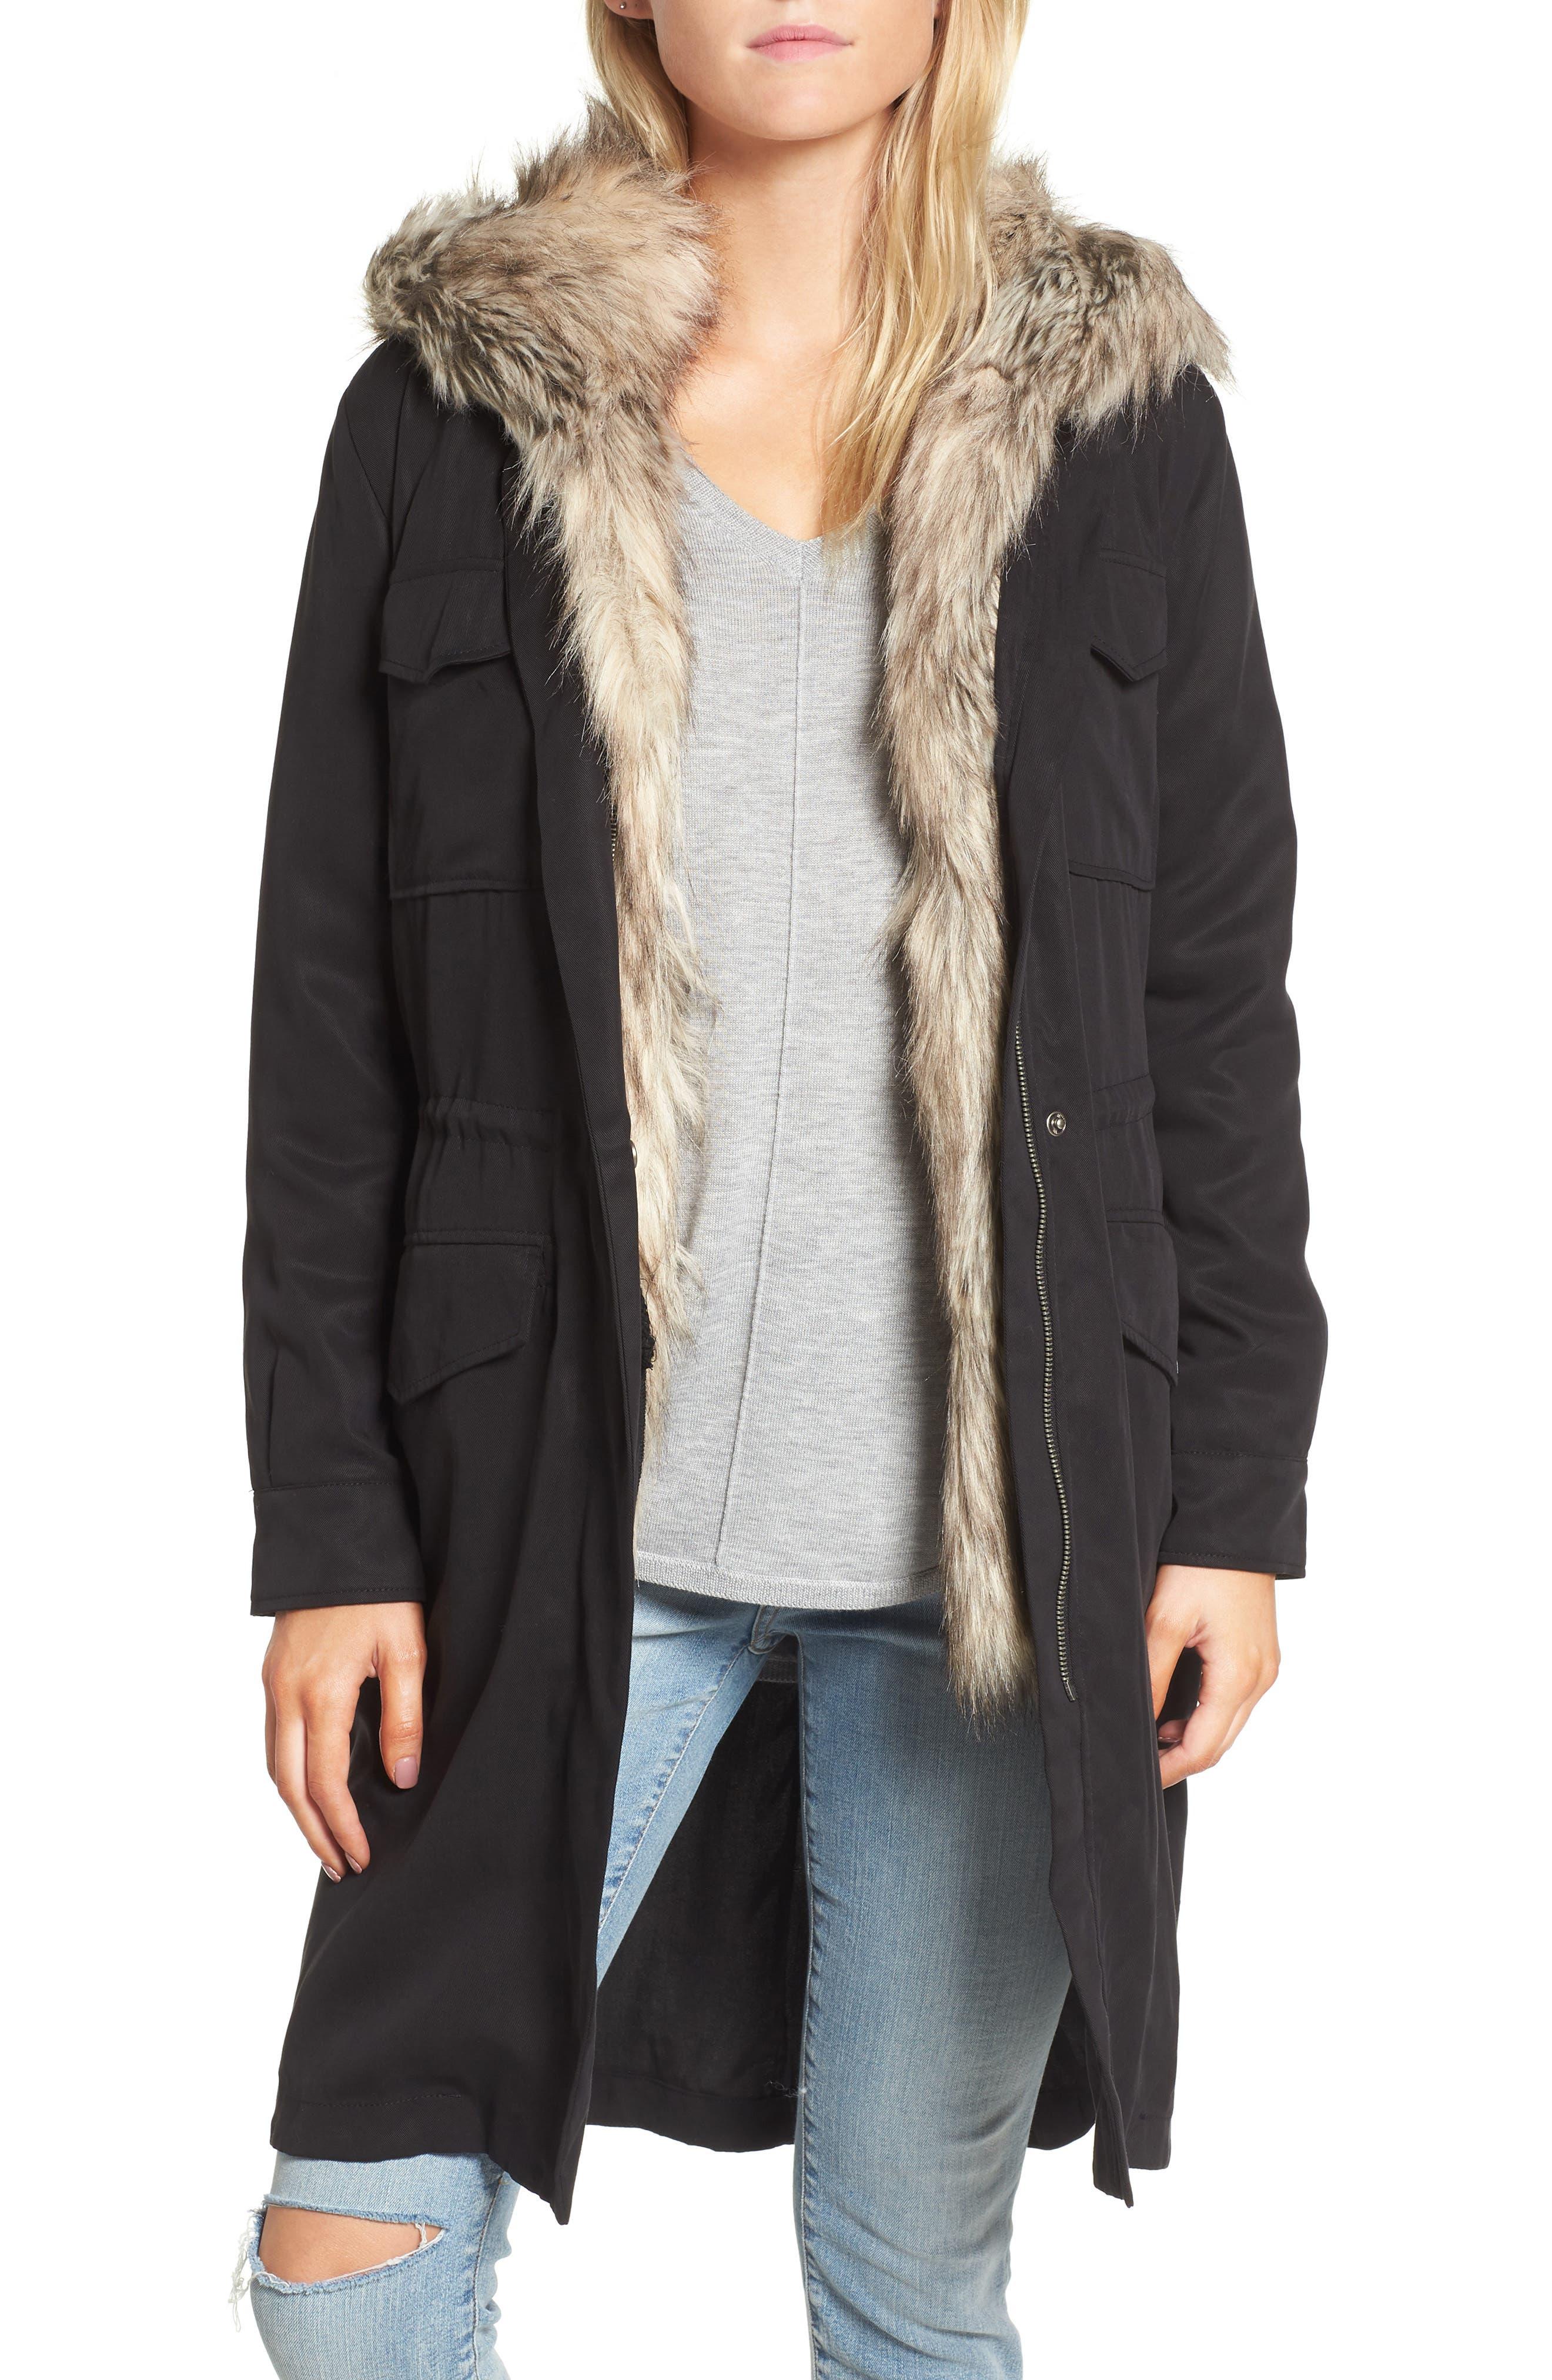 Main Image - BB Dakota Walsh Tencel® Coat with Detachable Hooded Faux Fur Vest